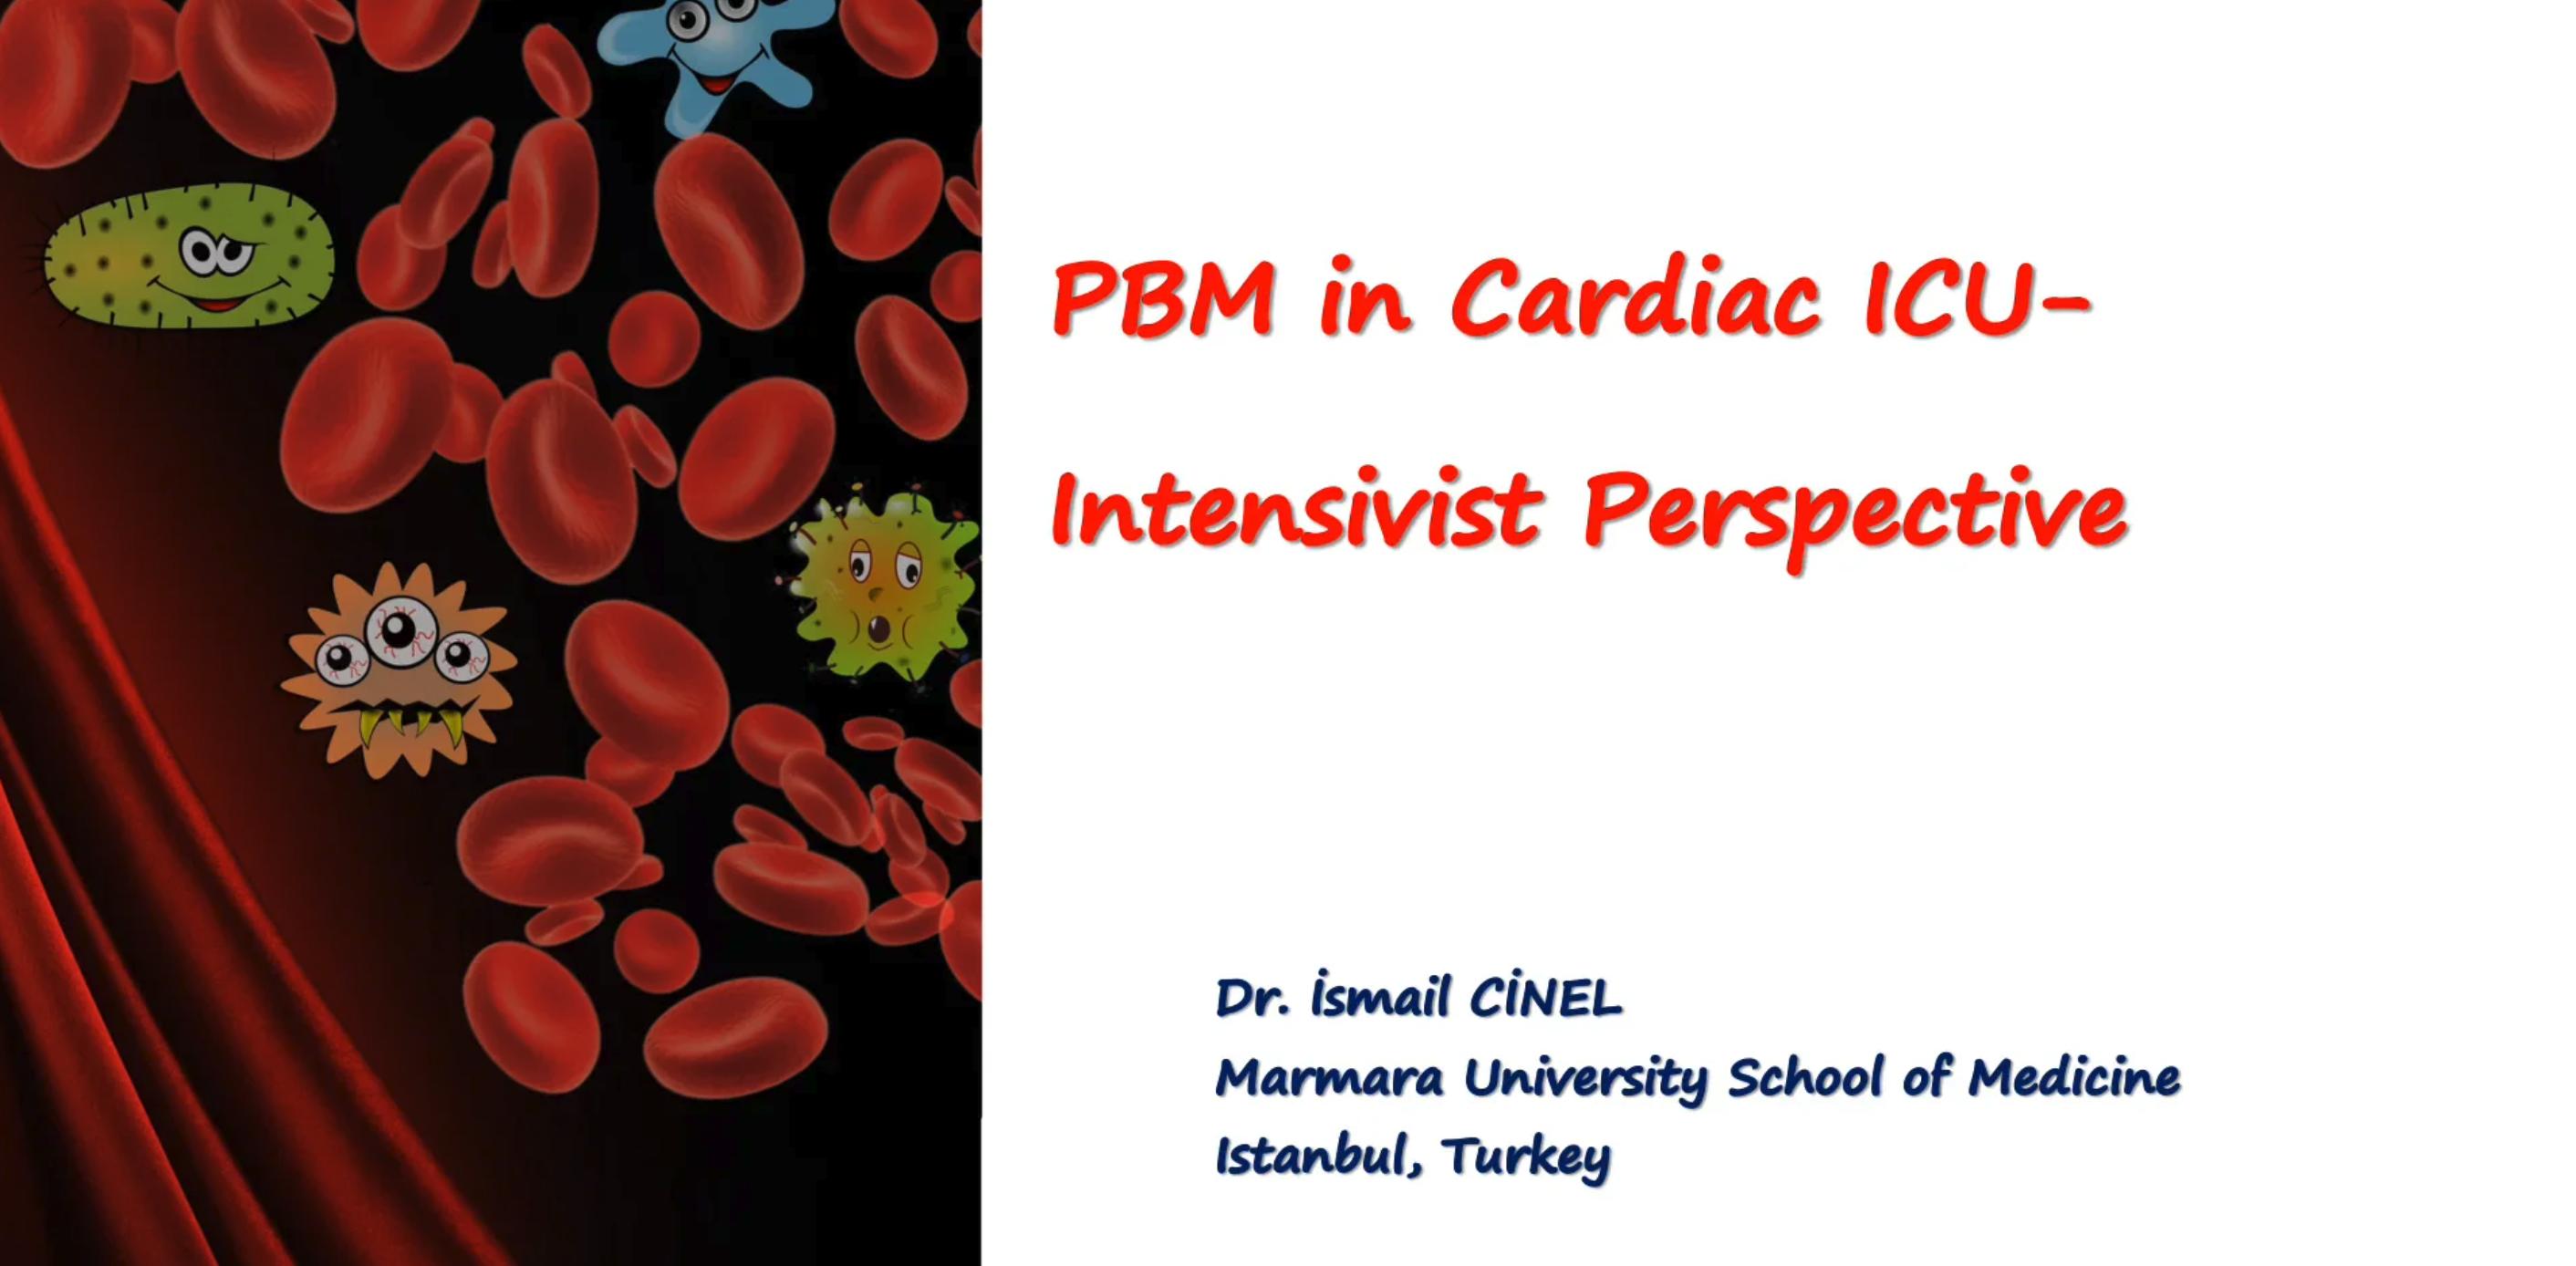 12_Cinel_PBM_Intensivist Perspective